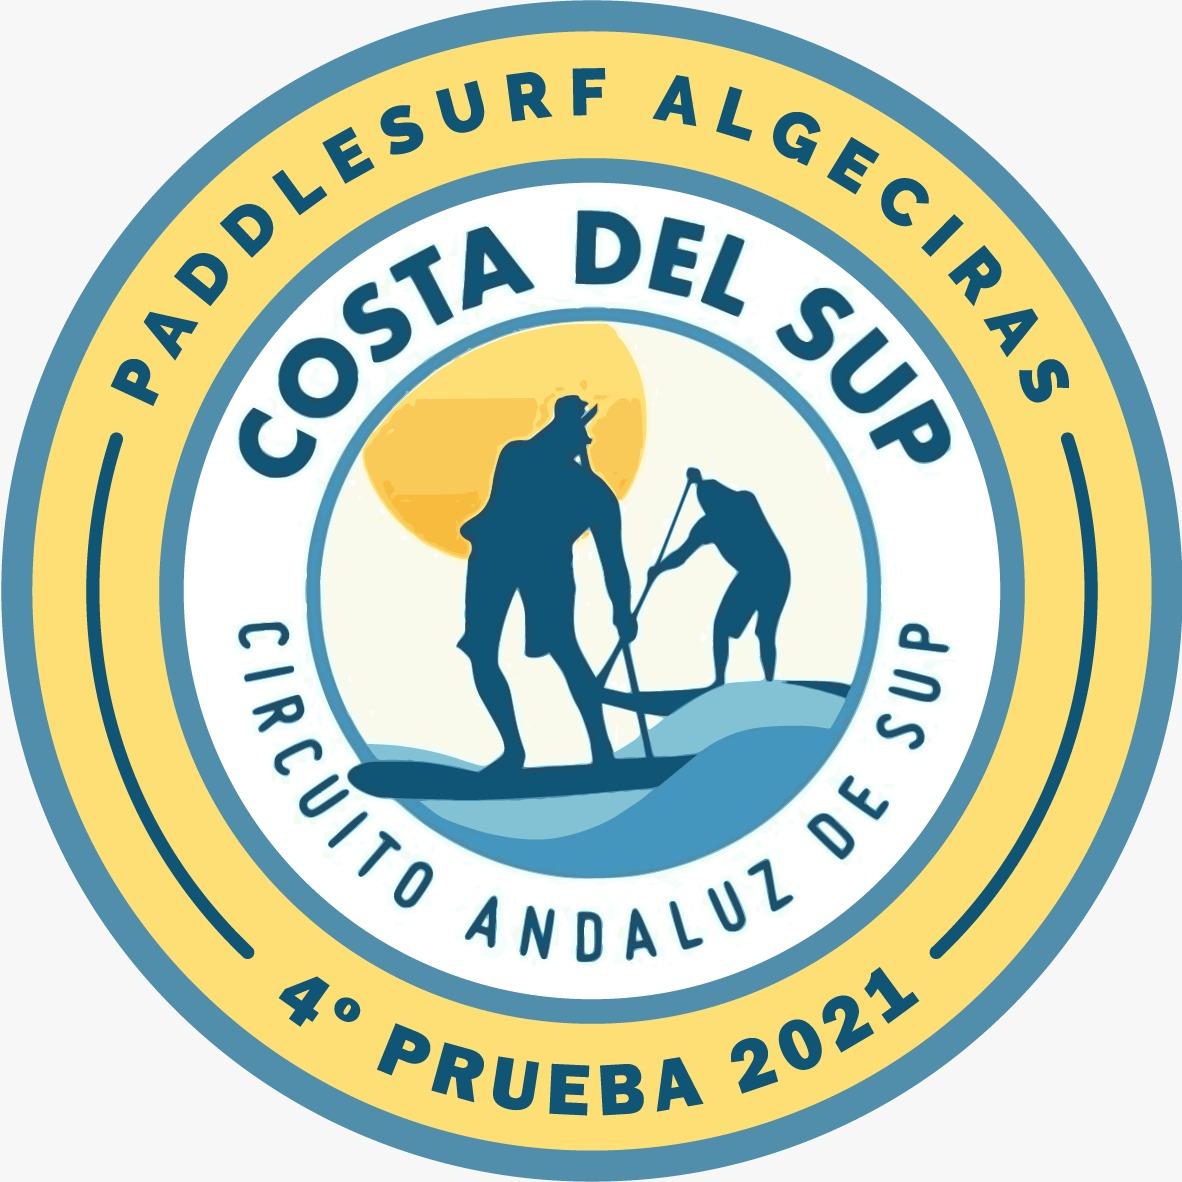 "La Liga Fesurfing SUP Race Andalucía ""CostadelSUP 2021"" llega a la Bahía de Algeciras"